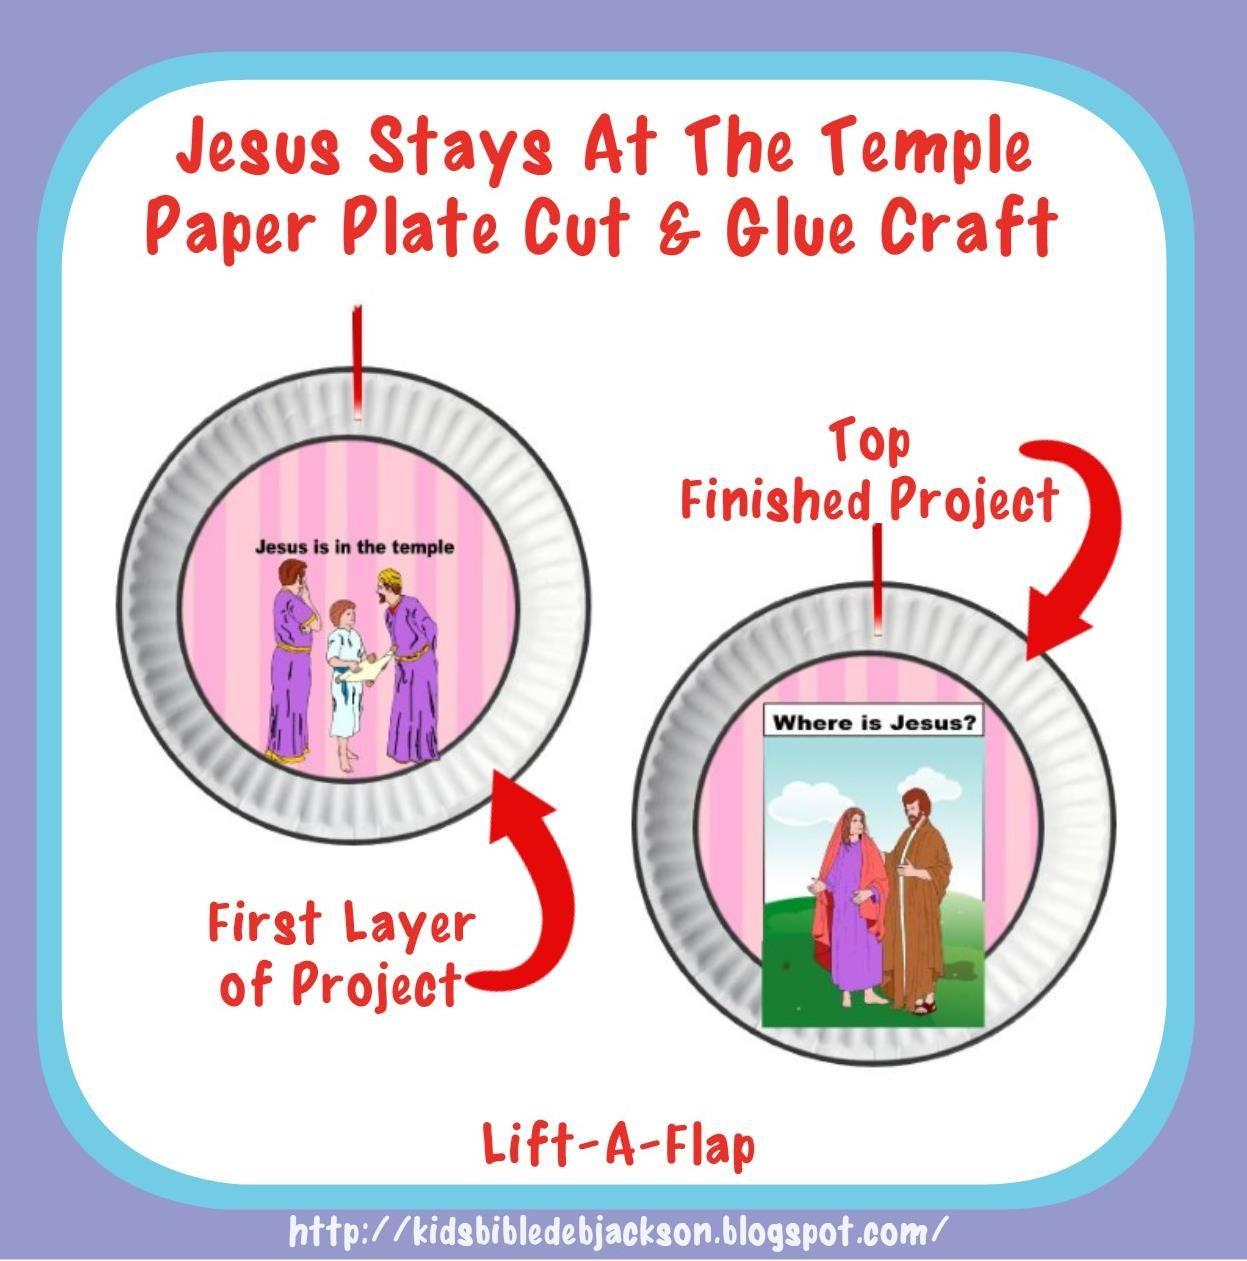 Good samaritan sunday school craft - Find This Pin And More On Sundayschool